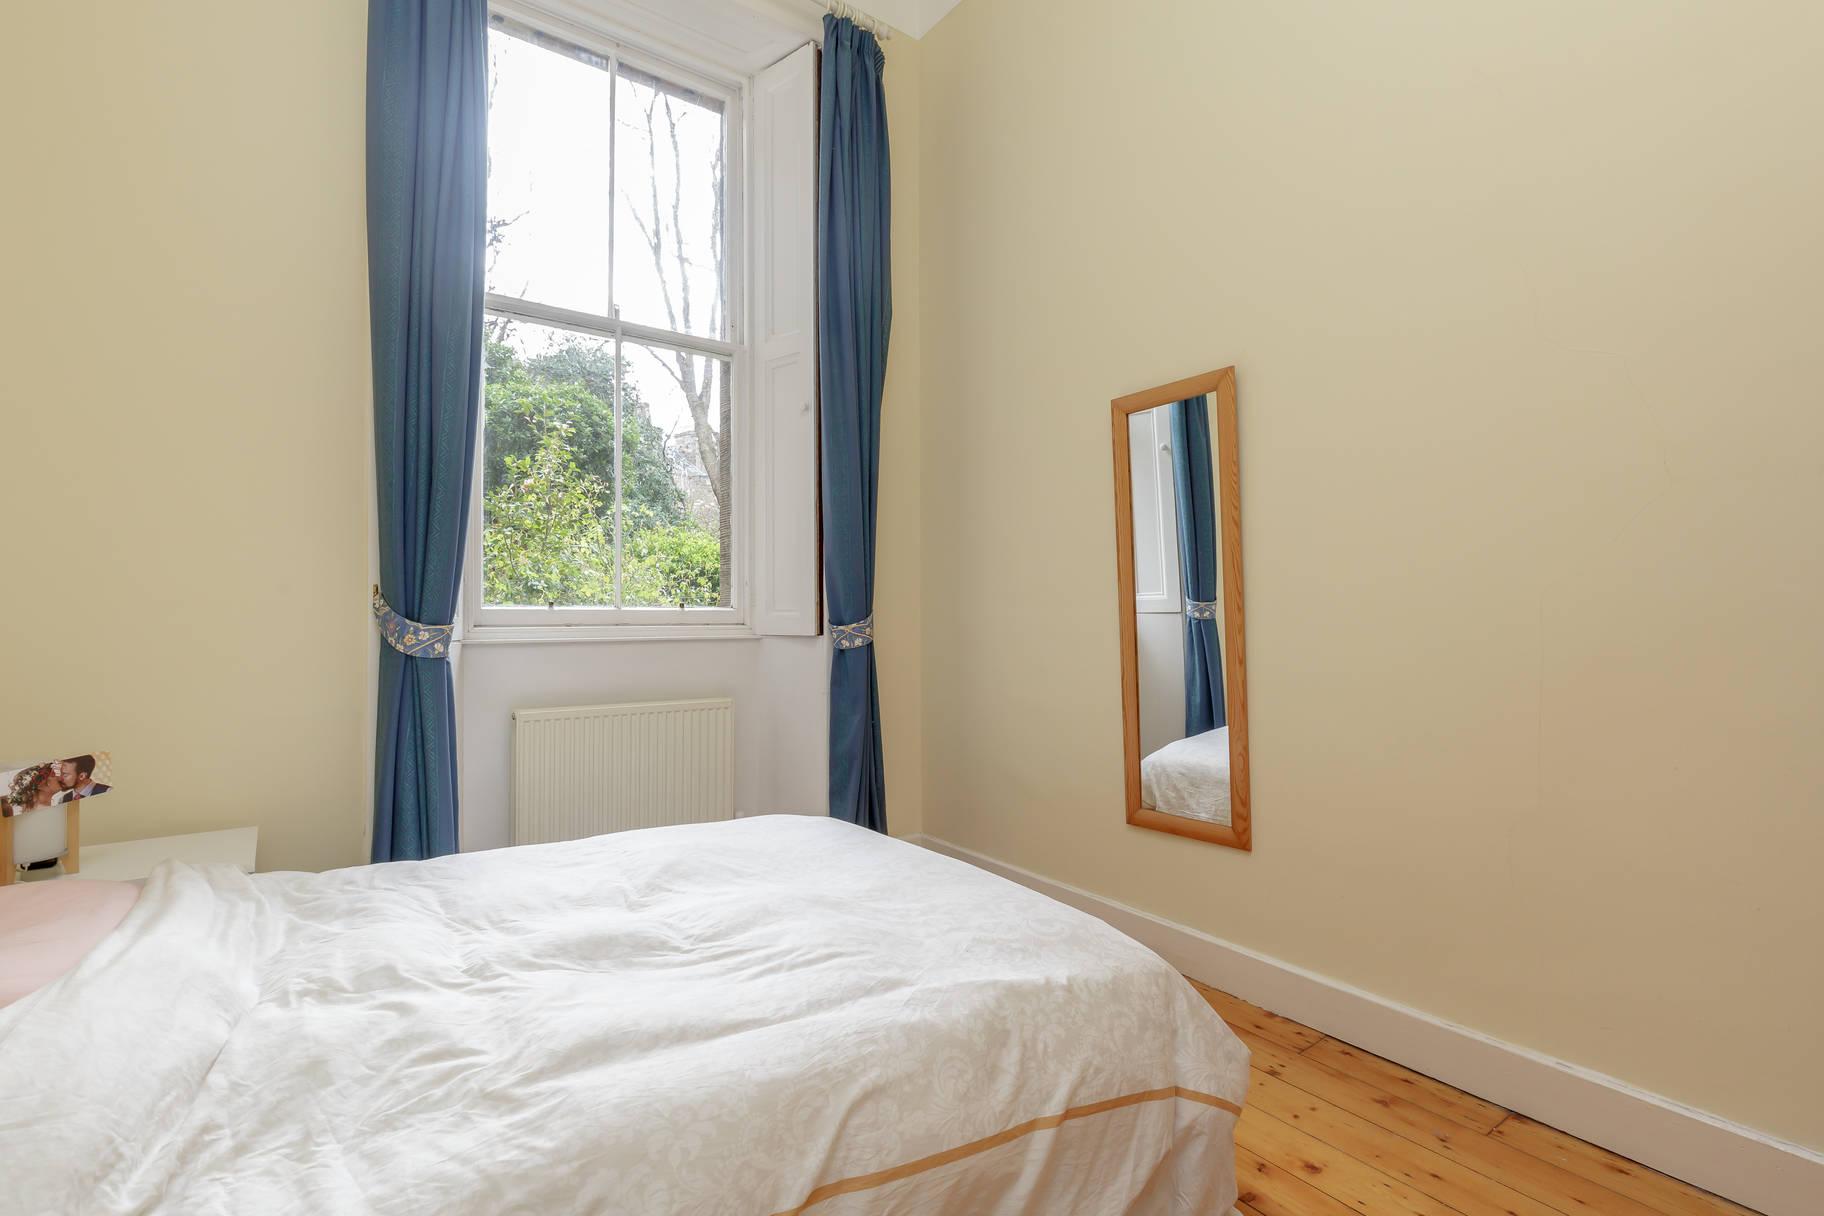 18 (GF) Glencairn Crescent, West End, Edinburgh, EH12 5BT